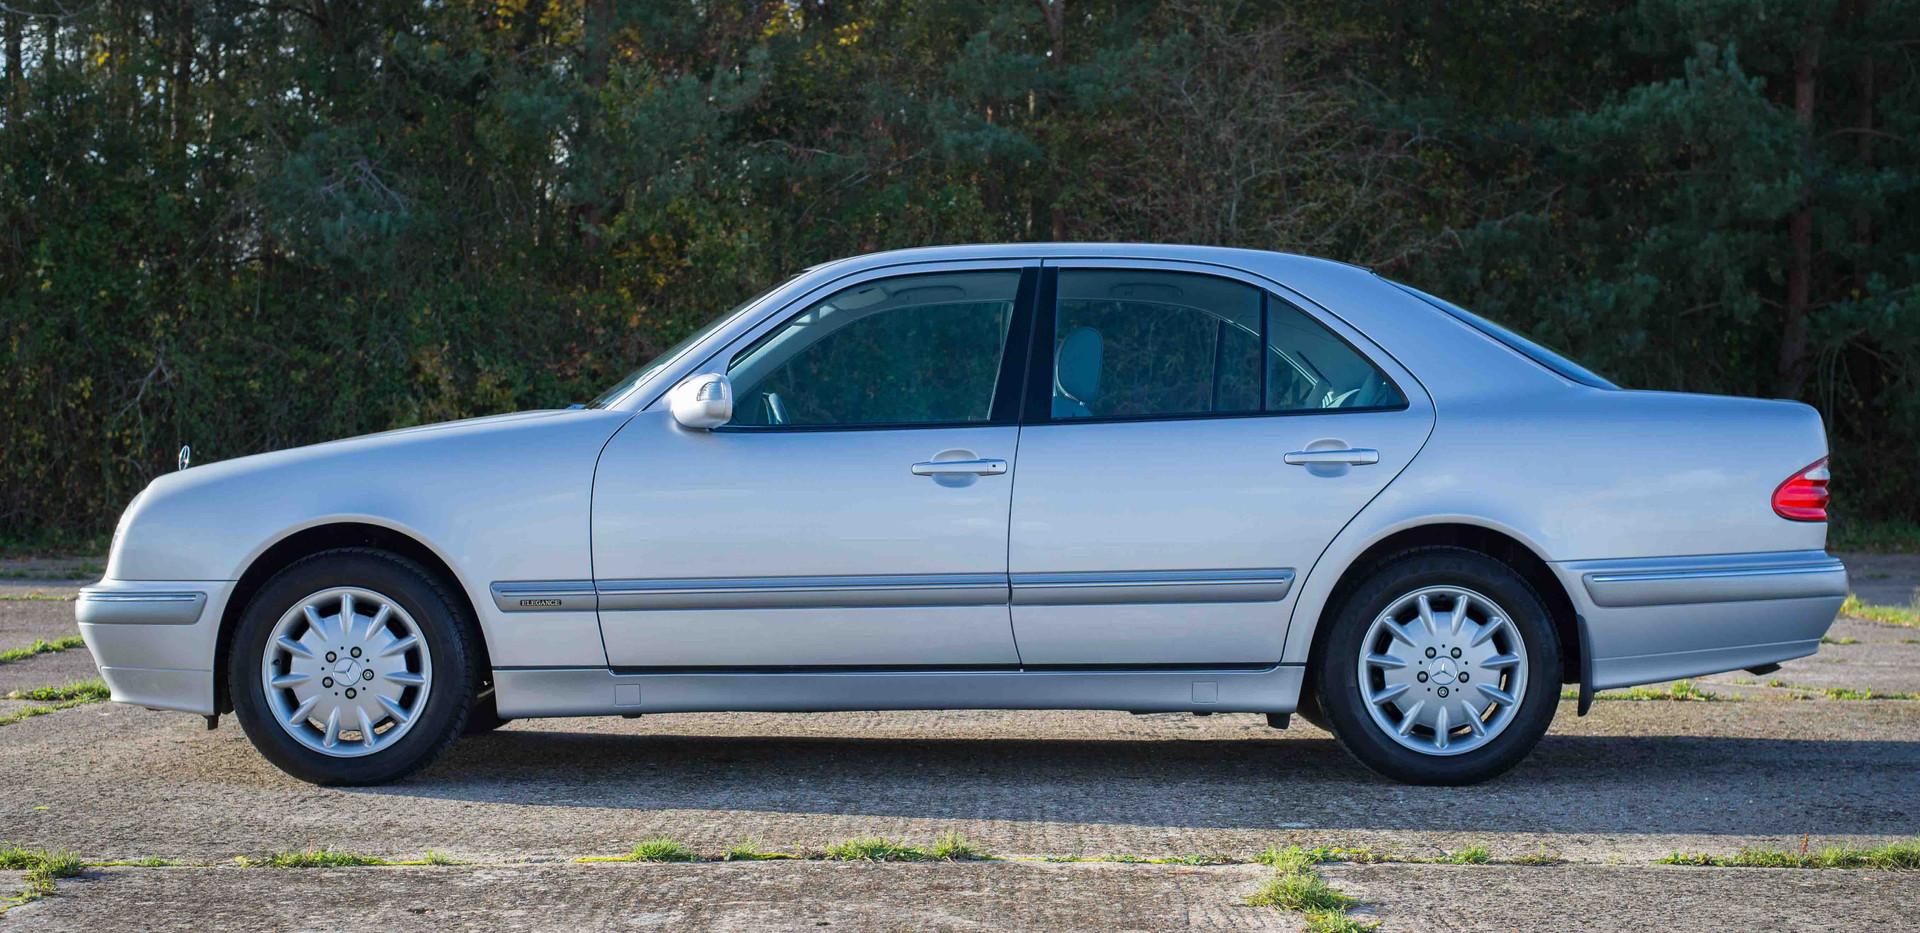 Mercedes E240 For Sale UK London  (22 of